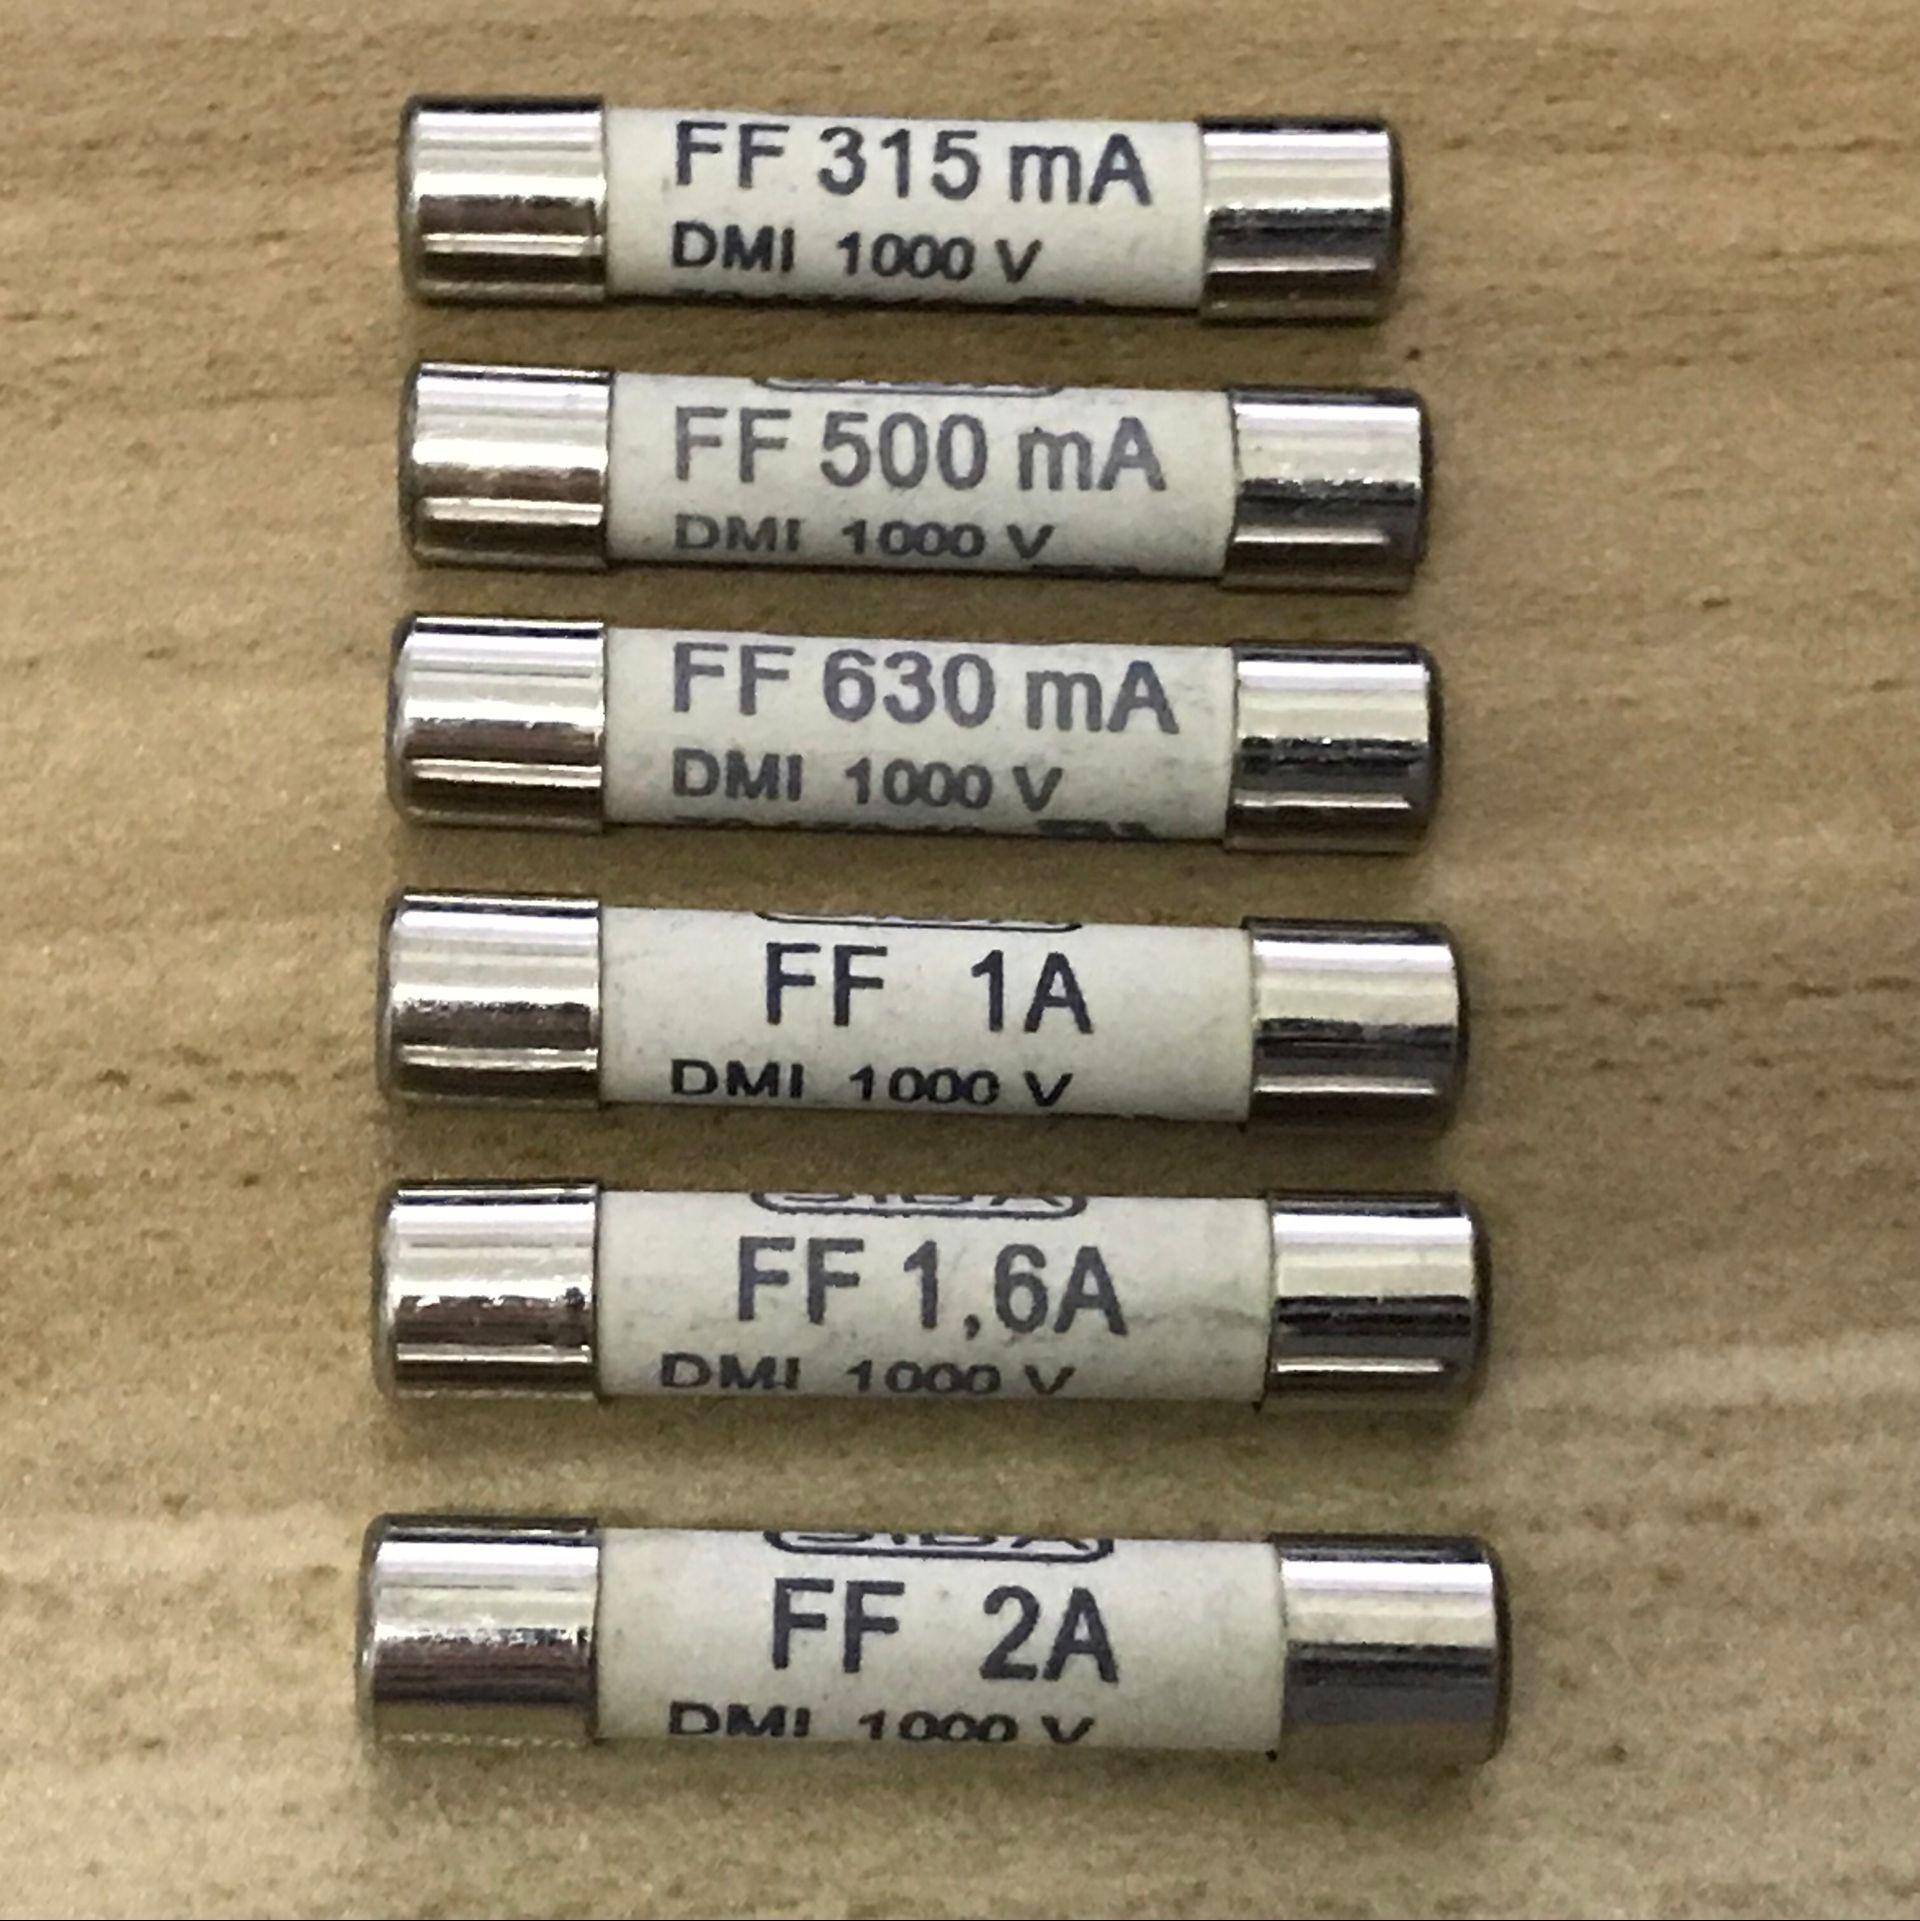 0,2 a SIBA fuse 20x5mm Céramique Rapide Blow 200 ma 70-007-33